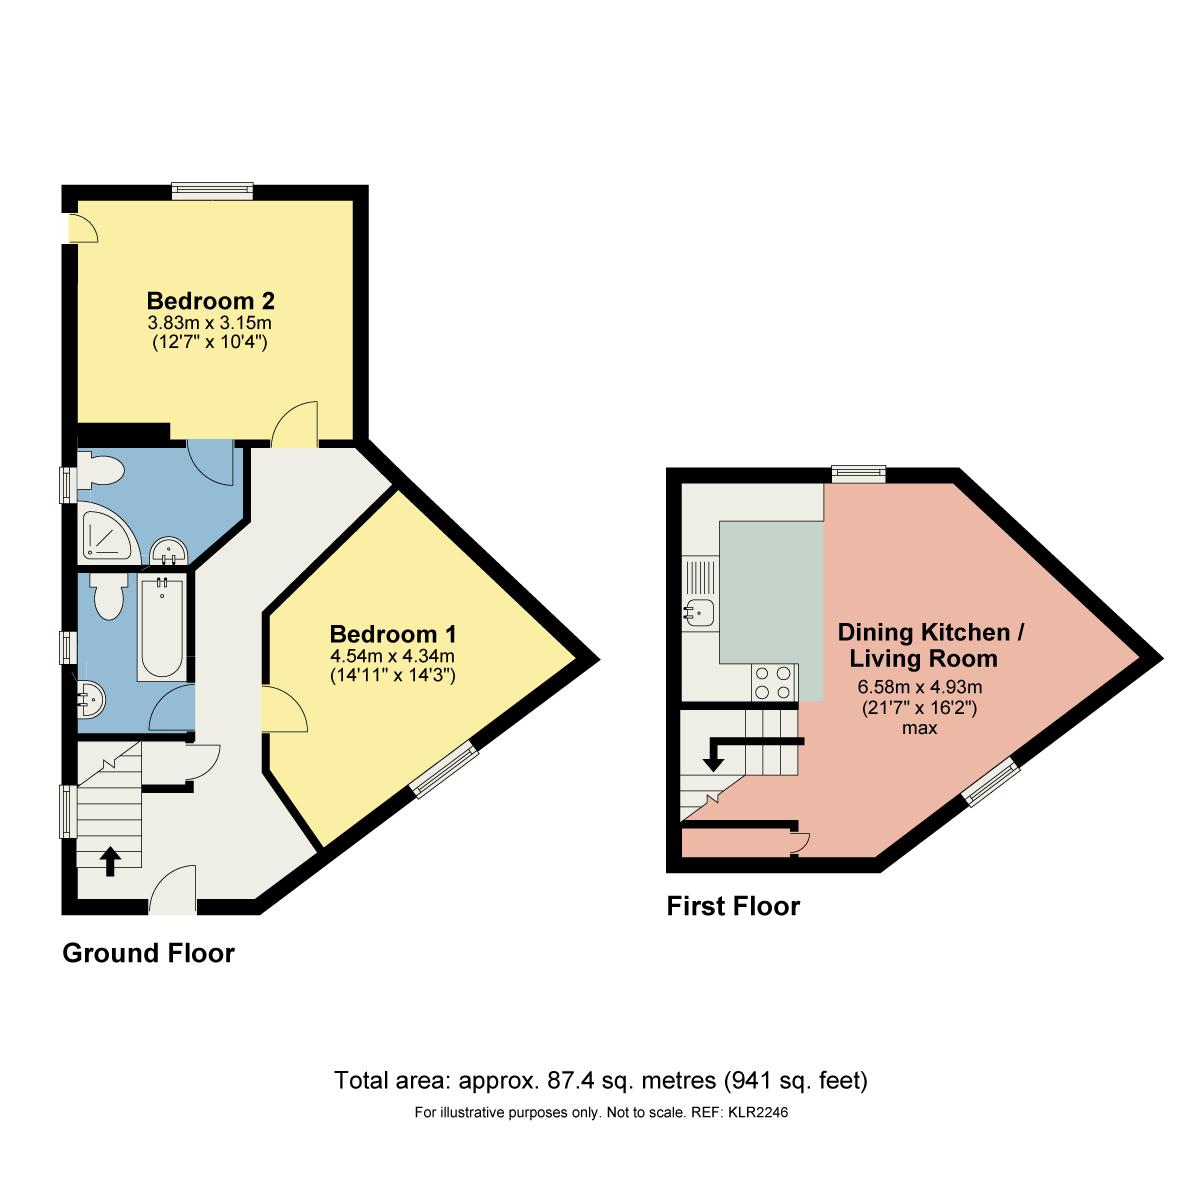 Floorplan Riverbank Cottage, Burrow, Nr Kirkby Lonsdale, Lancashire, LA6 2RJ